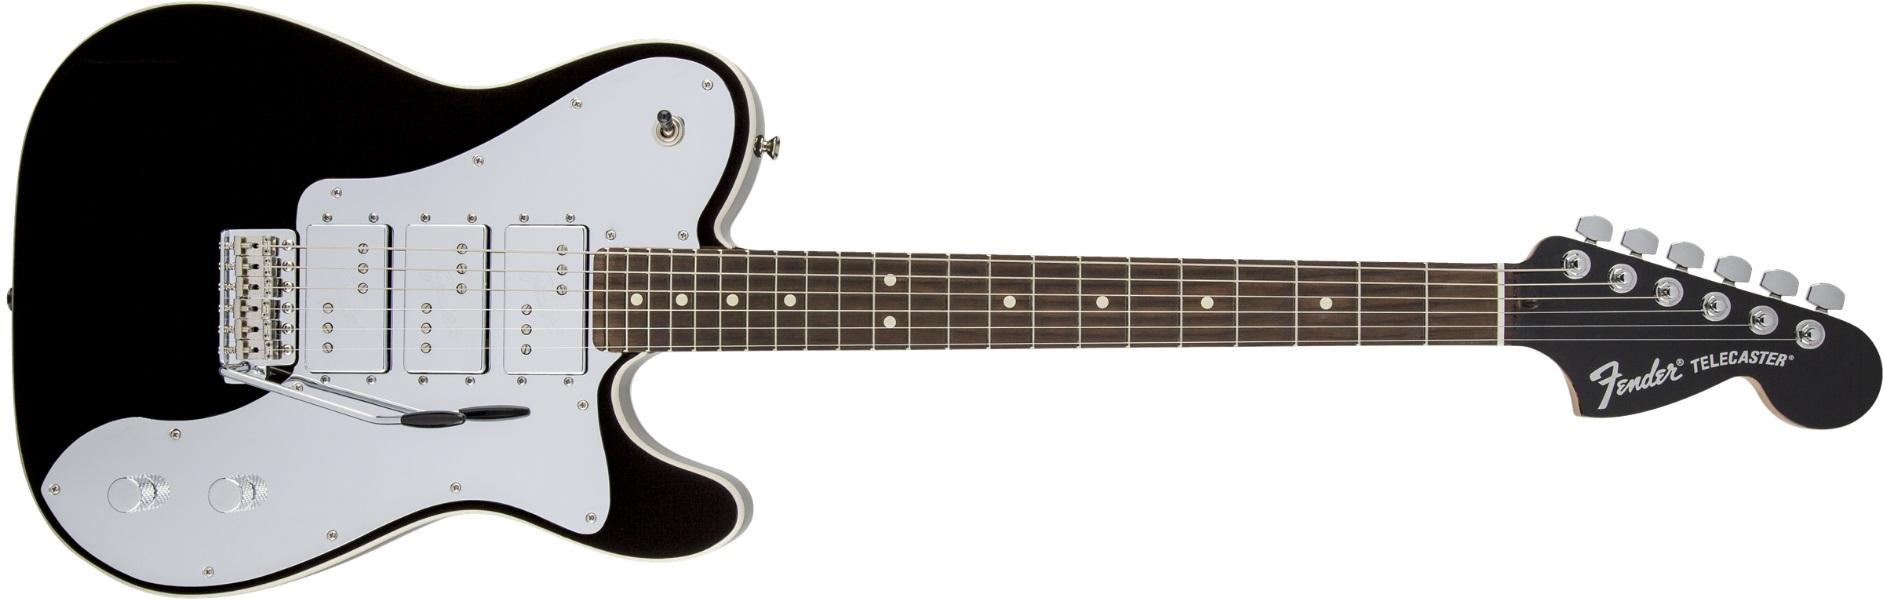 Fender ARTIST J5 Triple Tele Deluxe RW BK